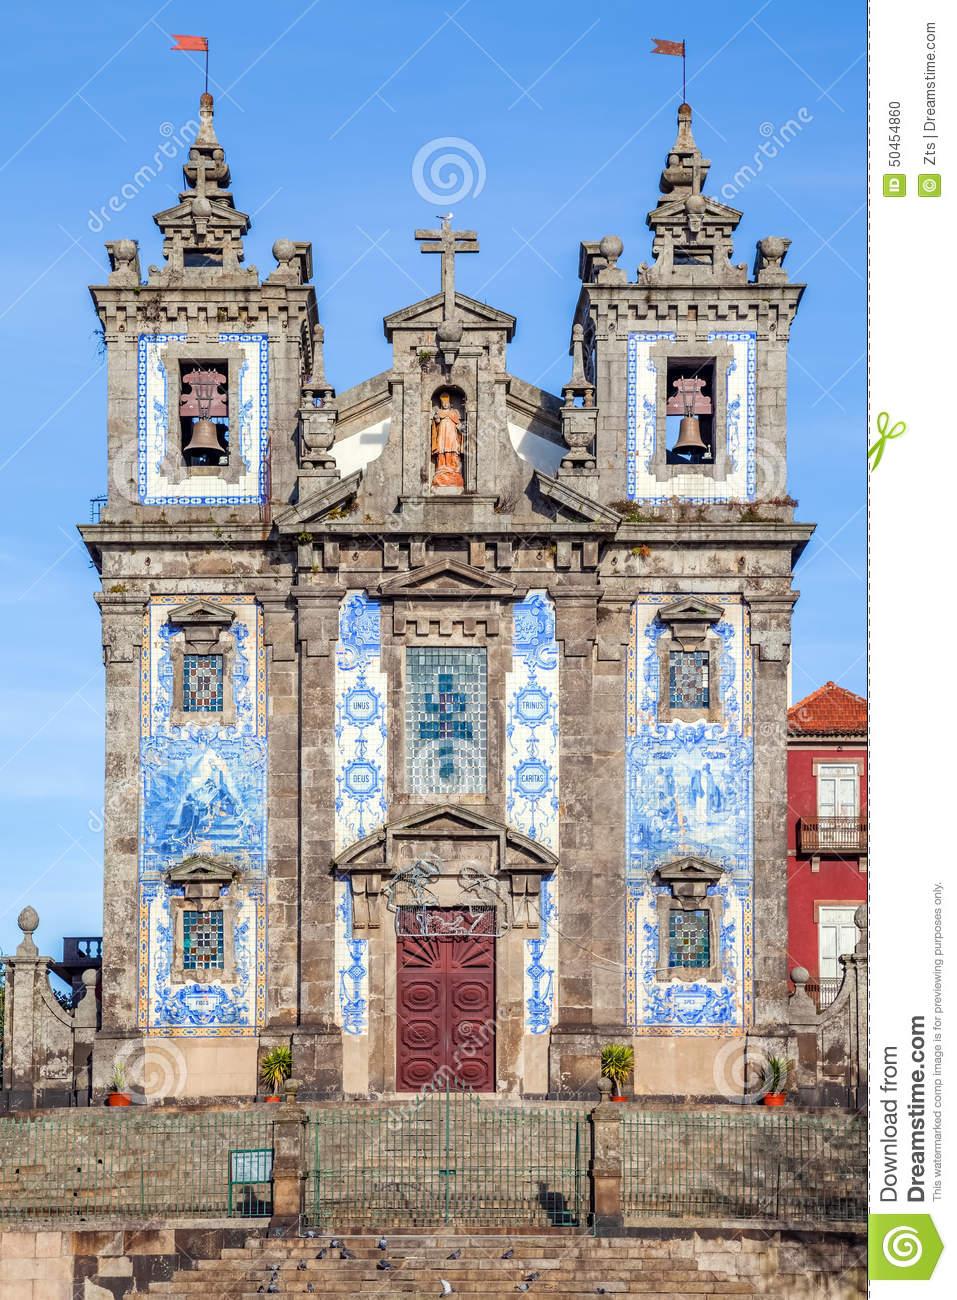 Santo Ildefonso Church In The City Of Porto, Portugal Stock Photo.